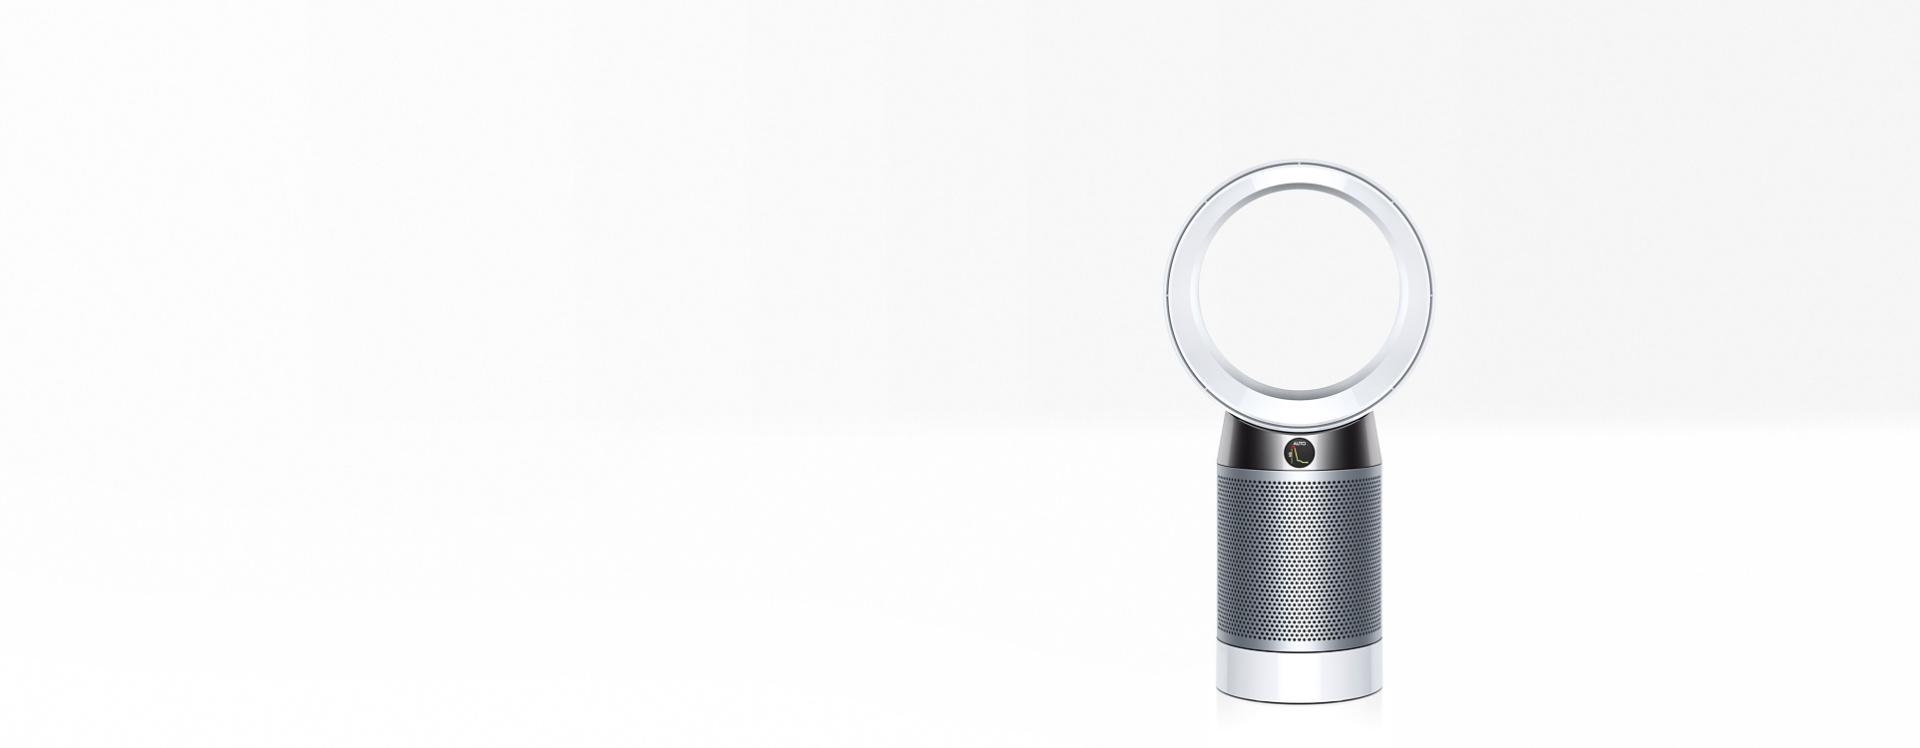 Dyson Pure Cool Advanced Technology Desk Air Purifier